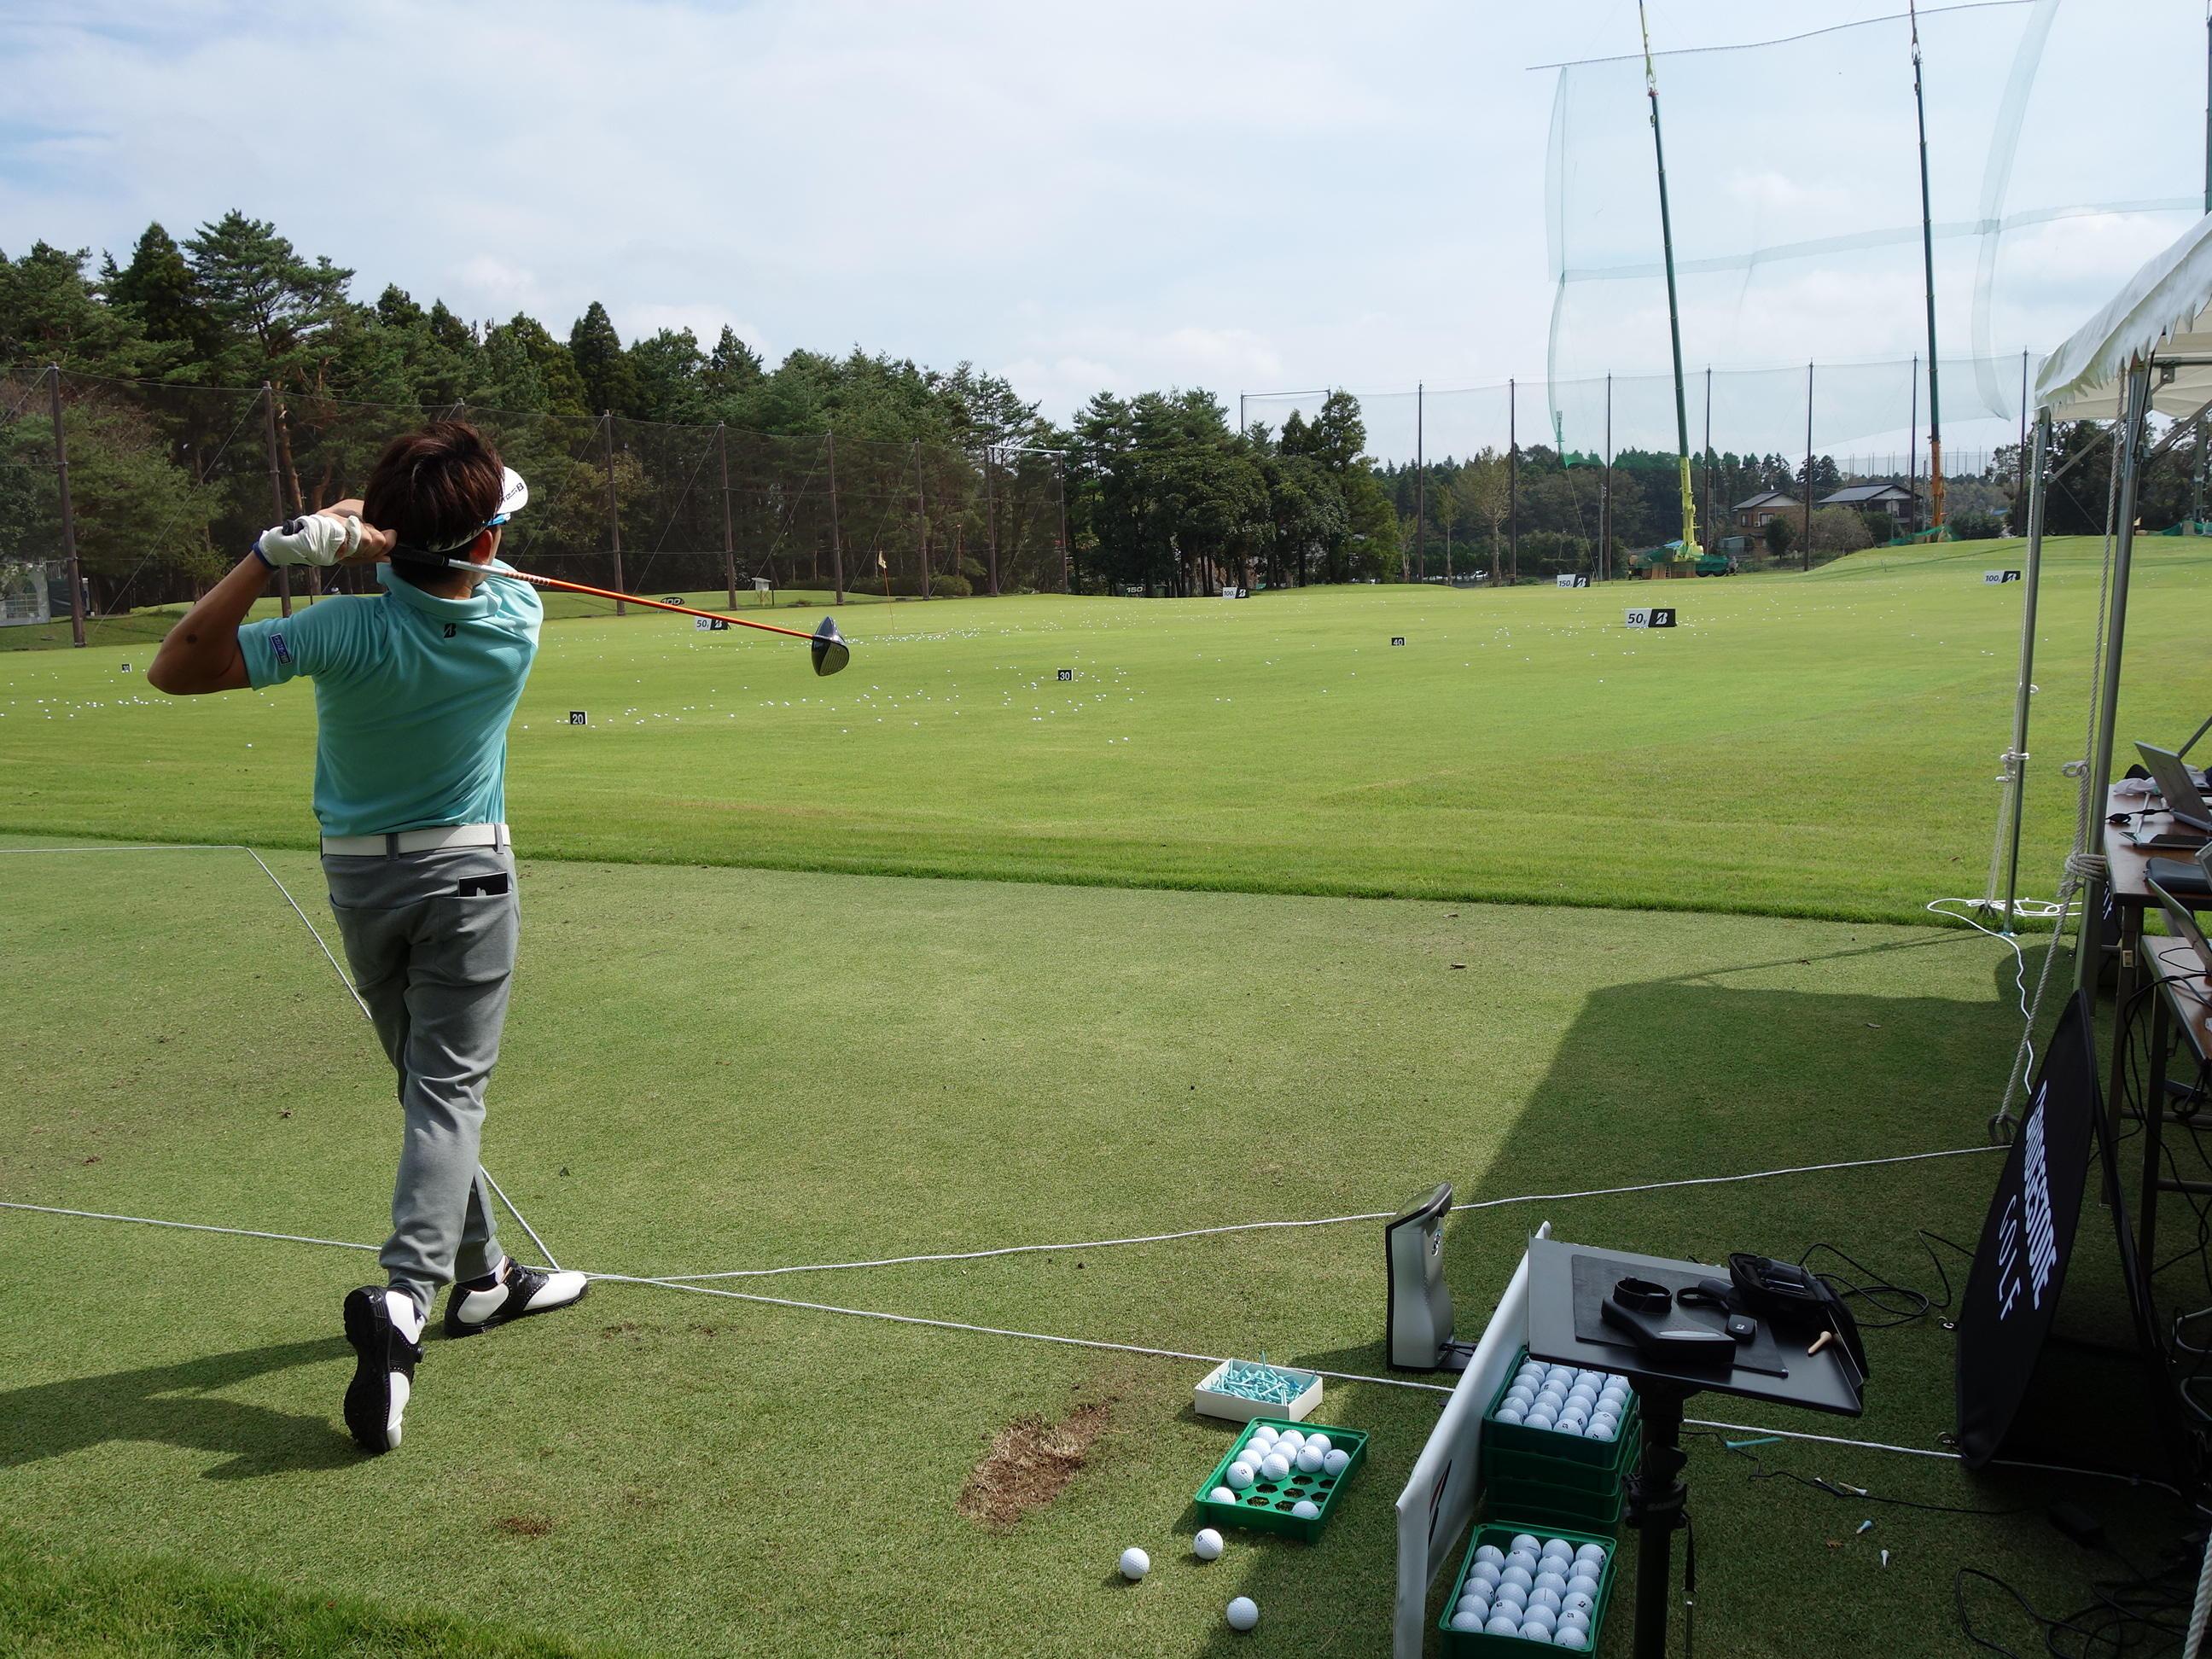 https://www.bs-golf.com/pro/13d0de215f03e36d681ed6baada1a36a3f372937.JPG